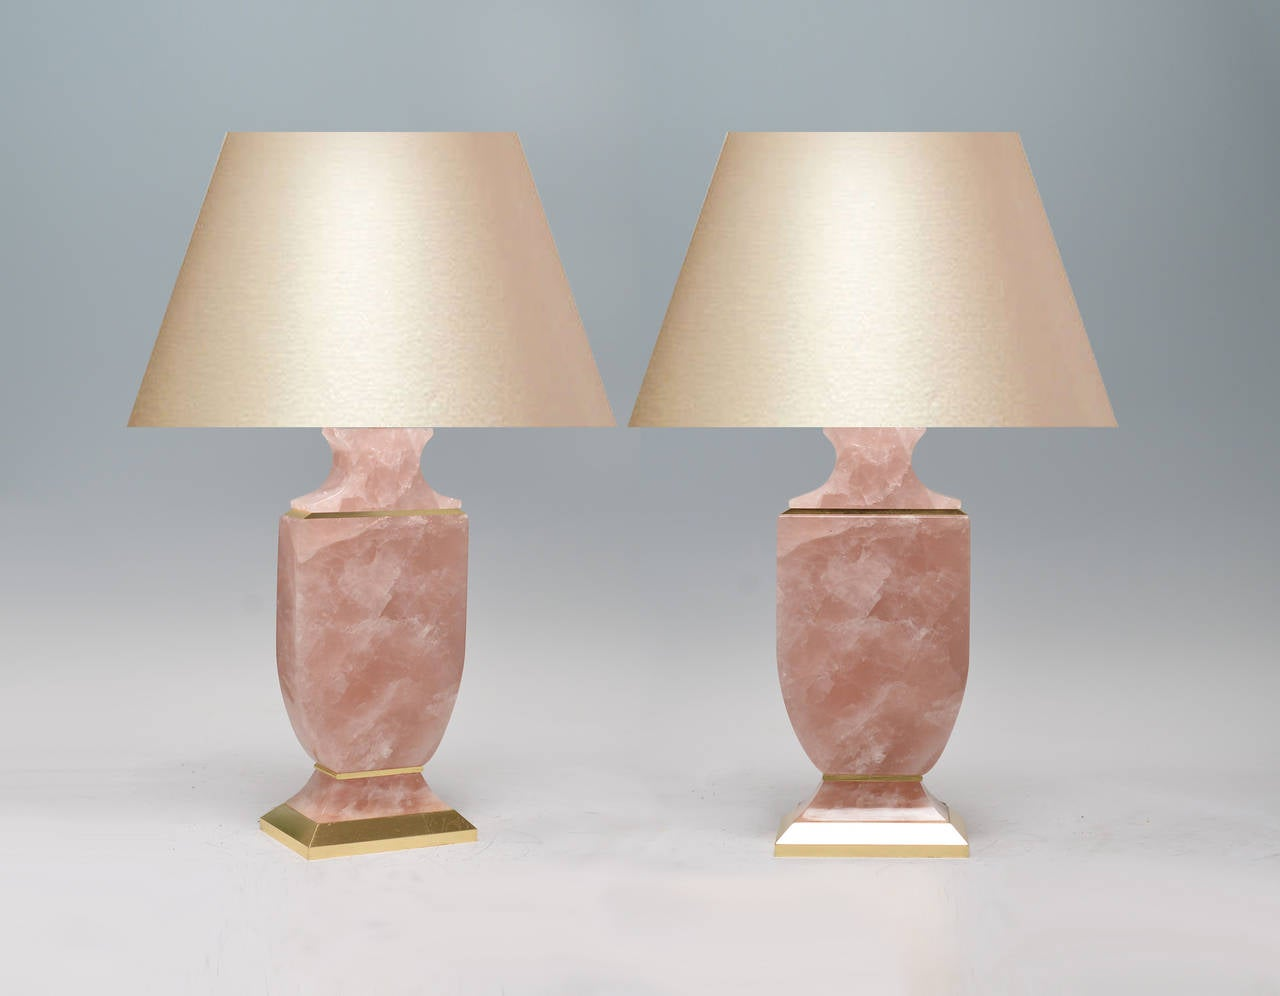 Pair of Carved Rock Crystal Rose Quartz Lamps at 1stdibs